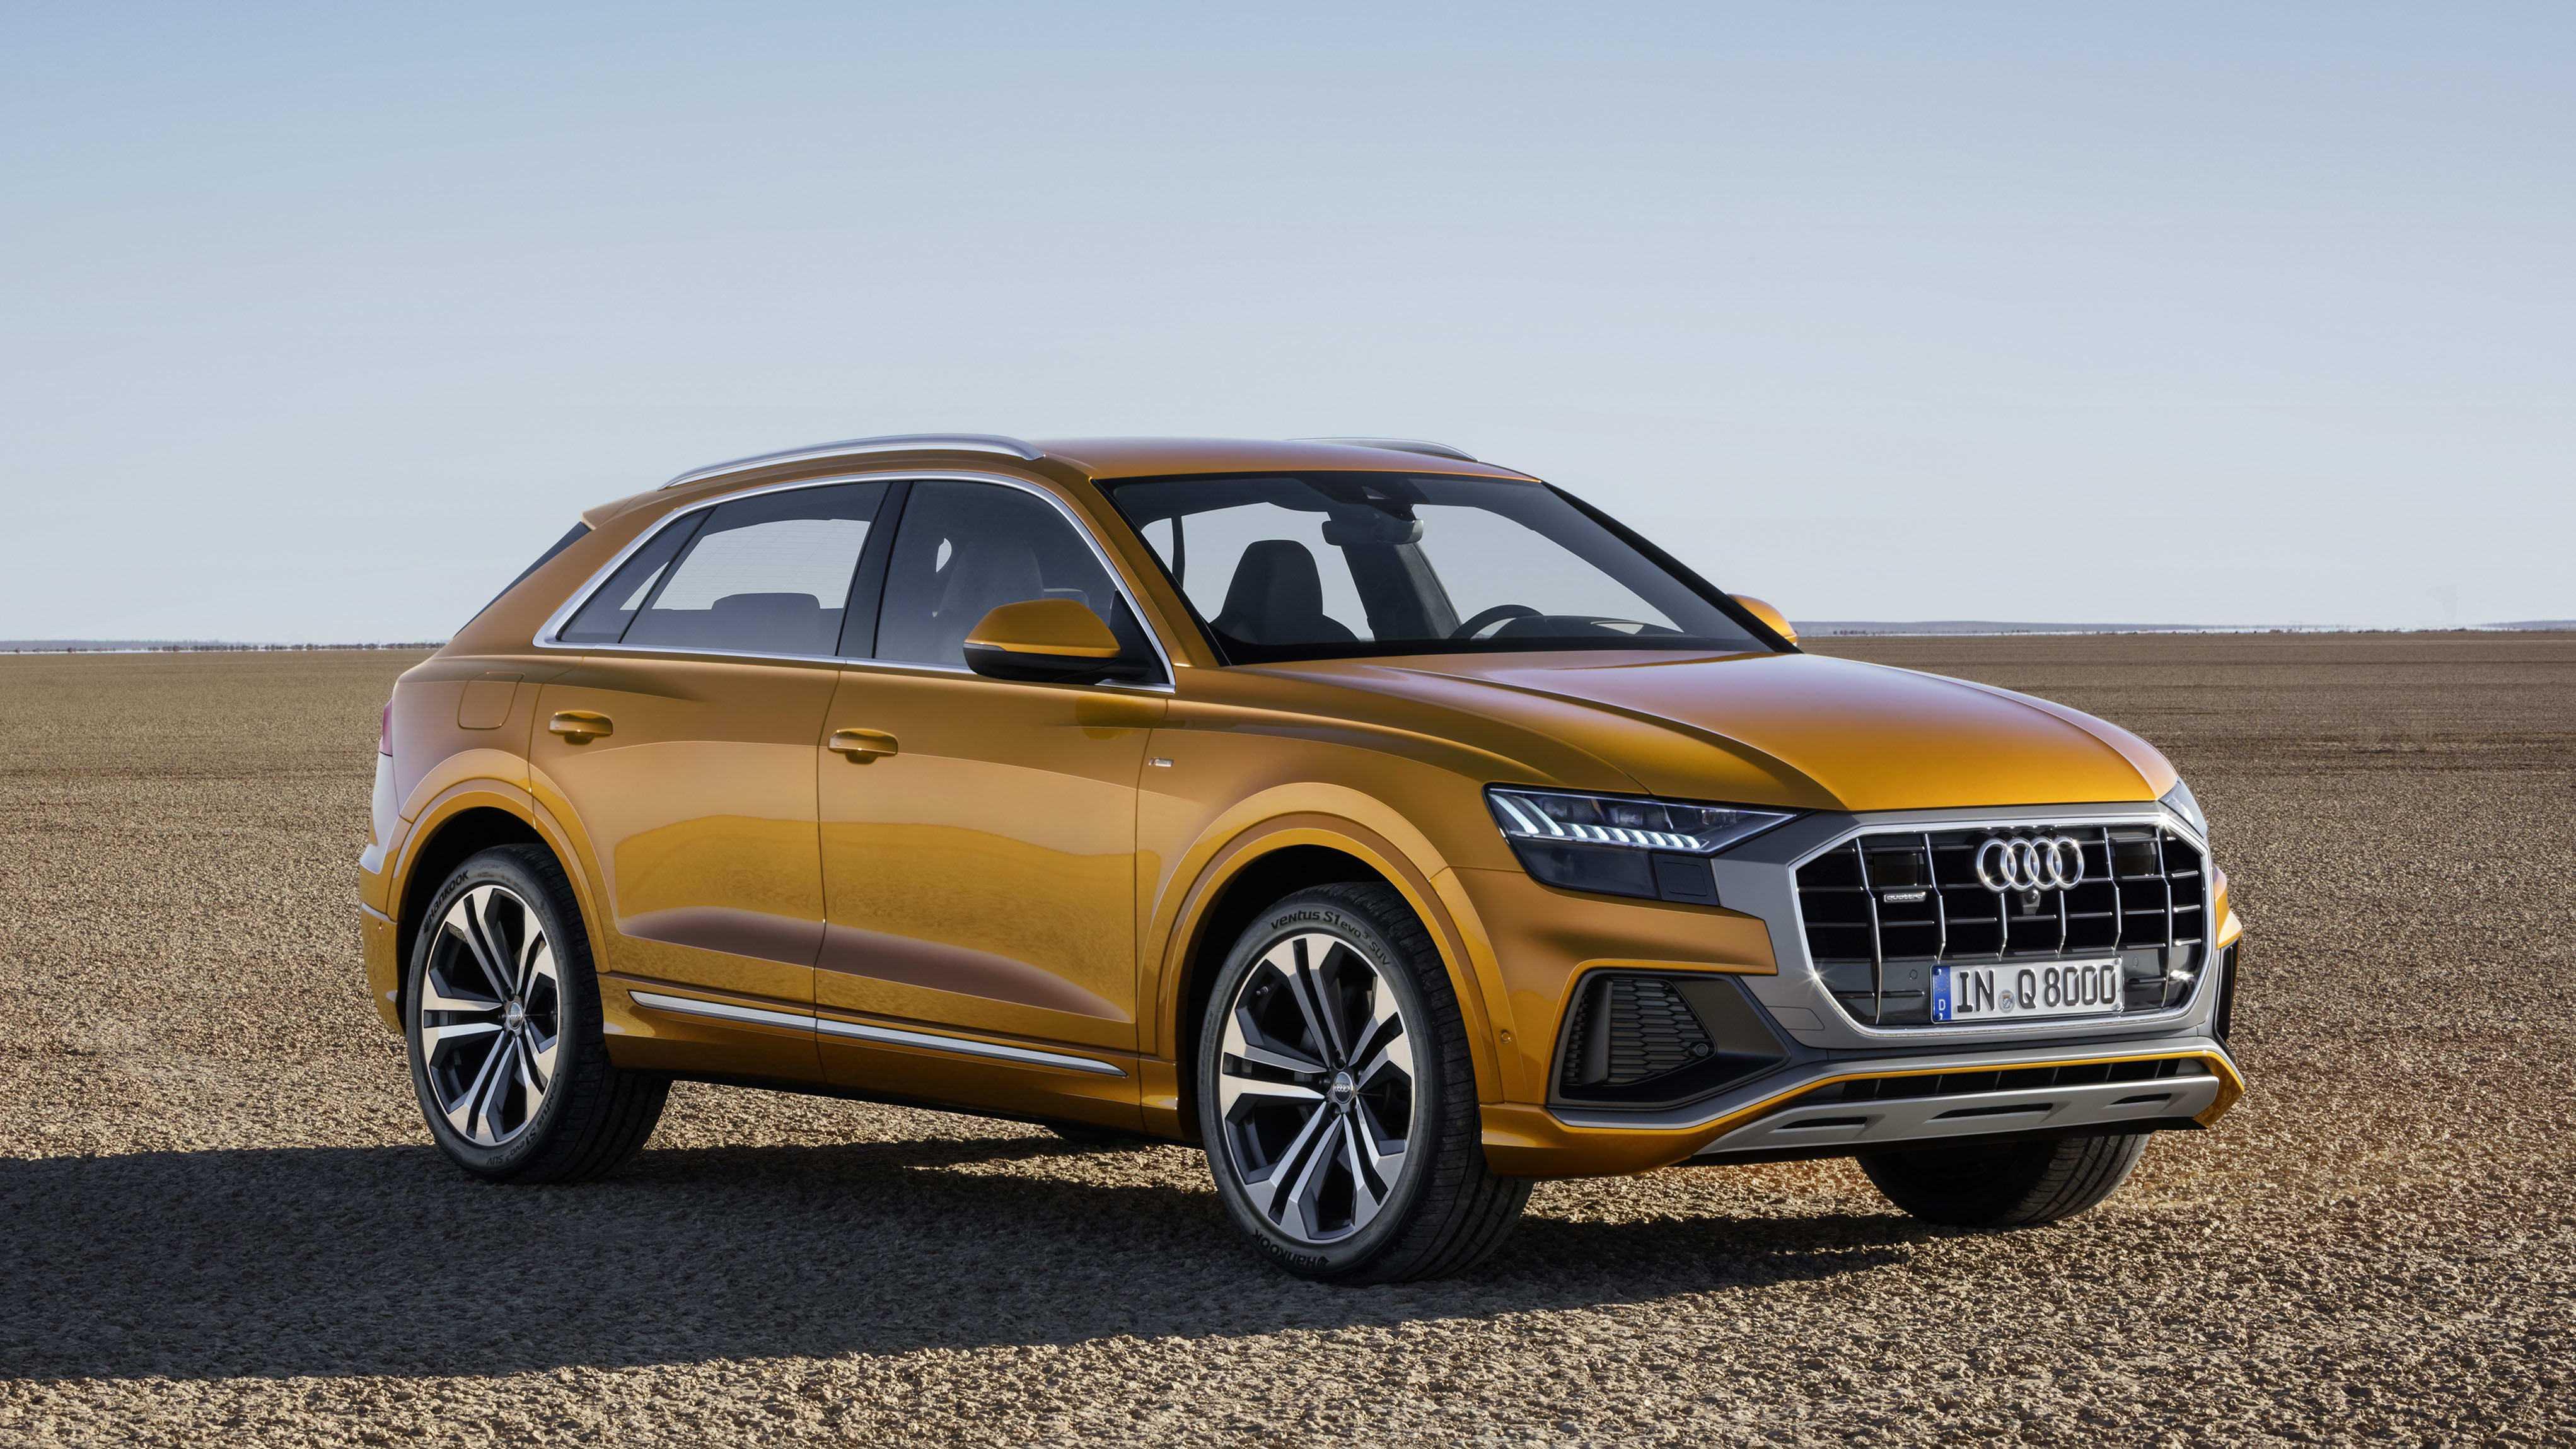 Audi r8 - обзор автомобиля, характеристики, комплектация, цены видео тест-драйв